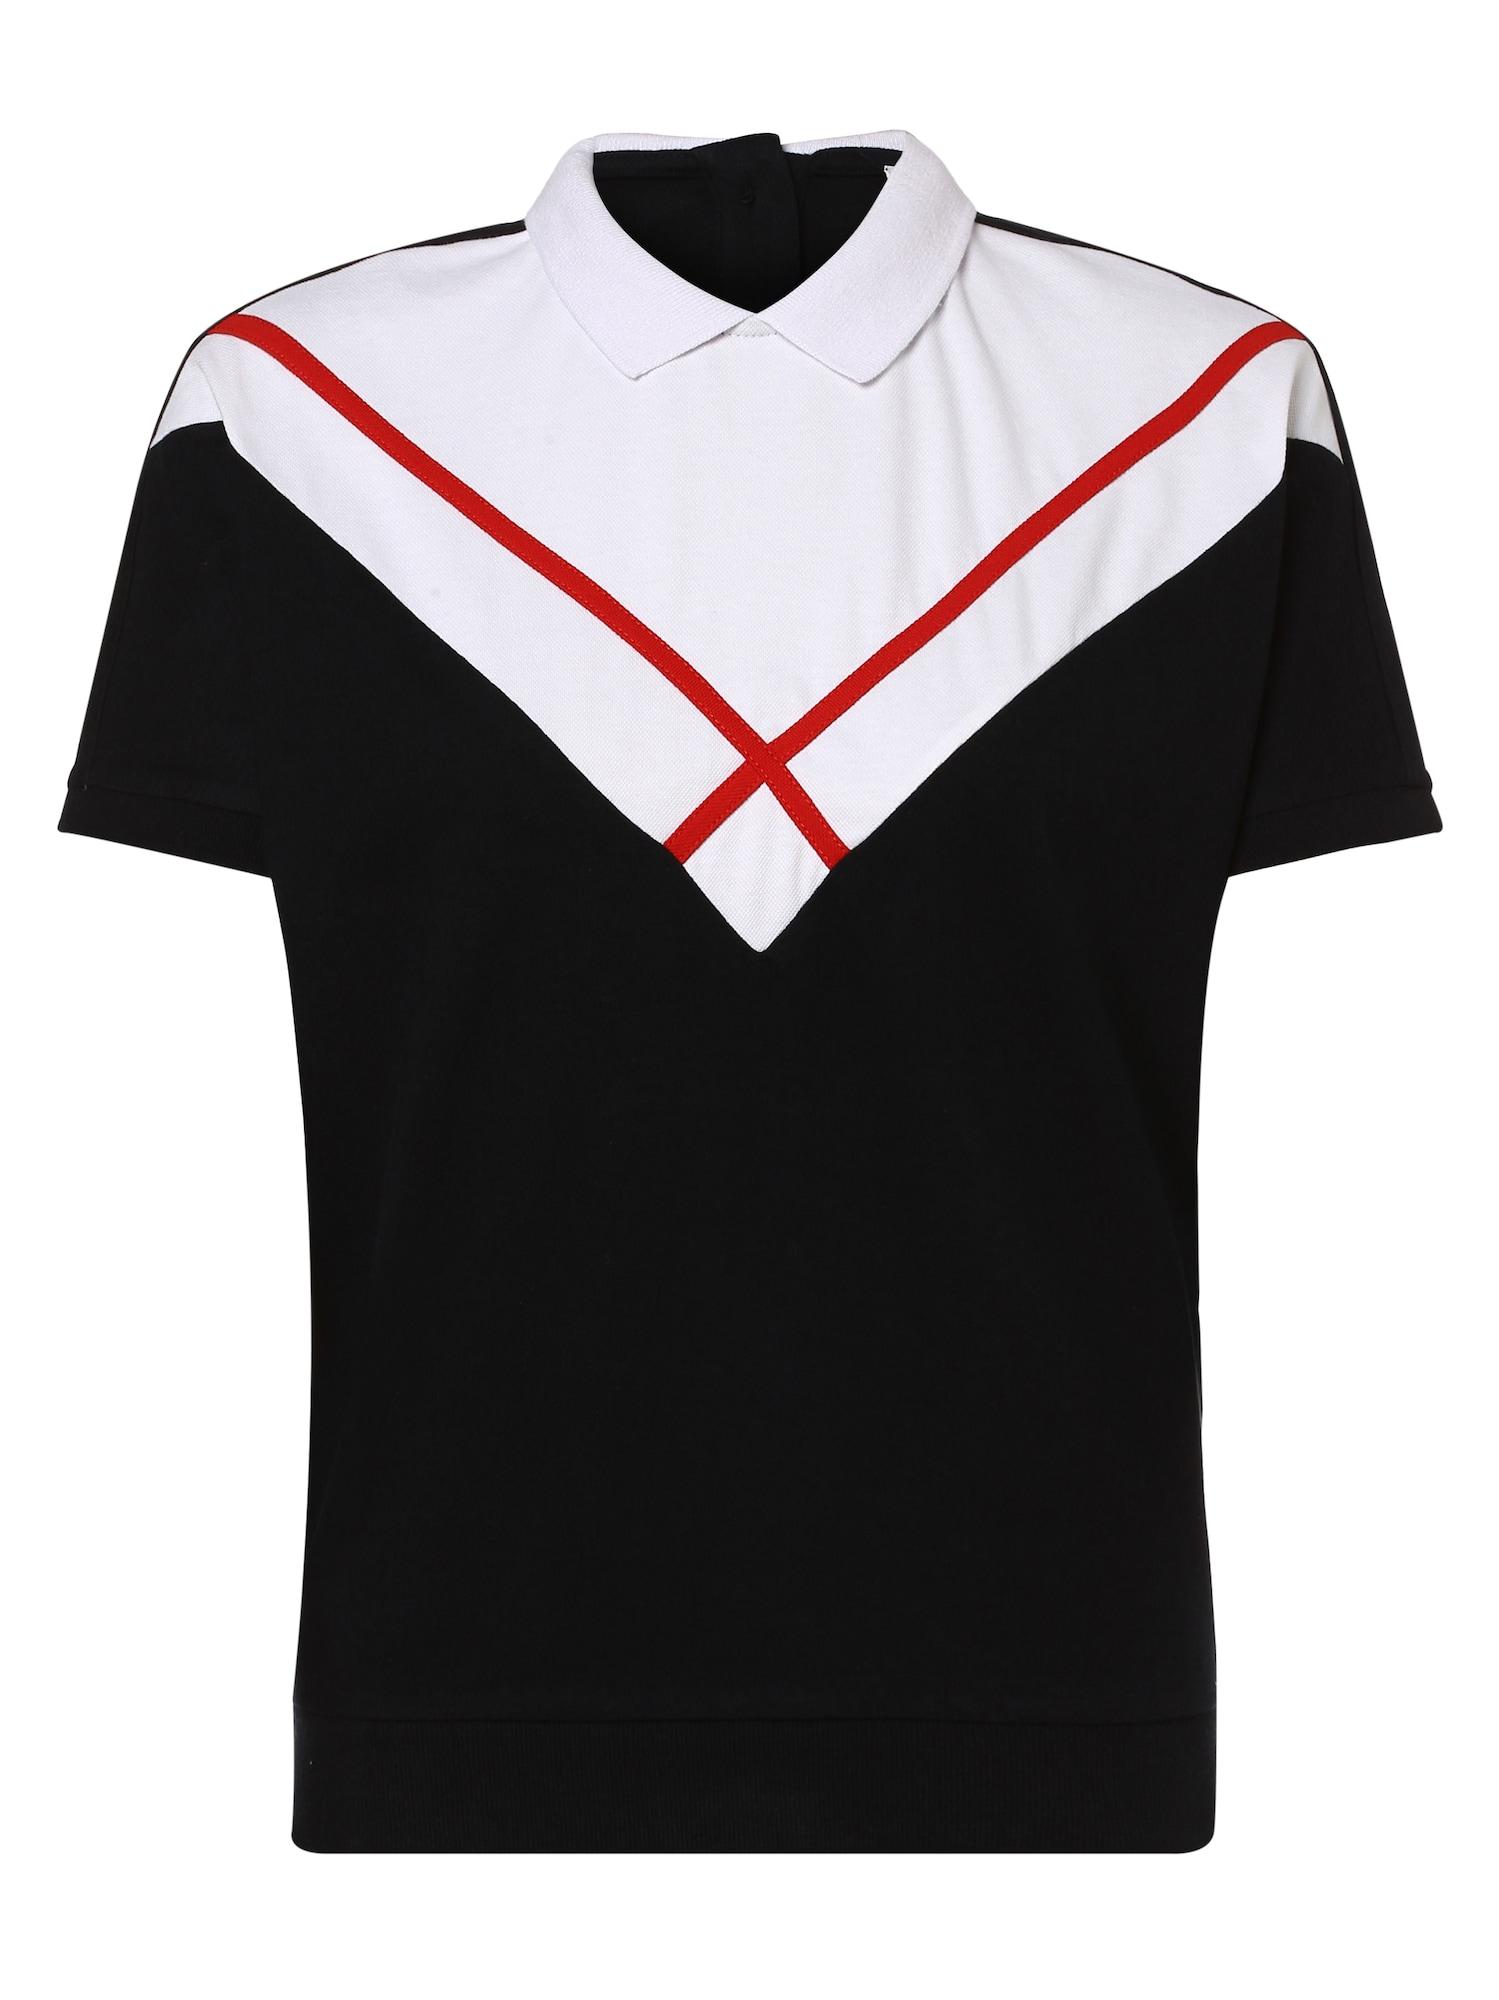 Poloshirt | Bekleidung > Shirts > Poloshirts | Marie Lund